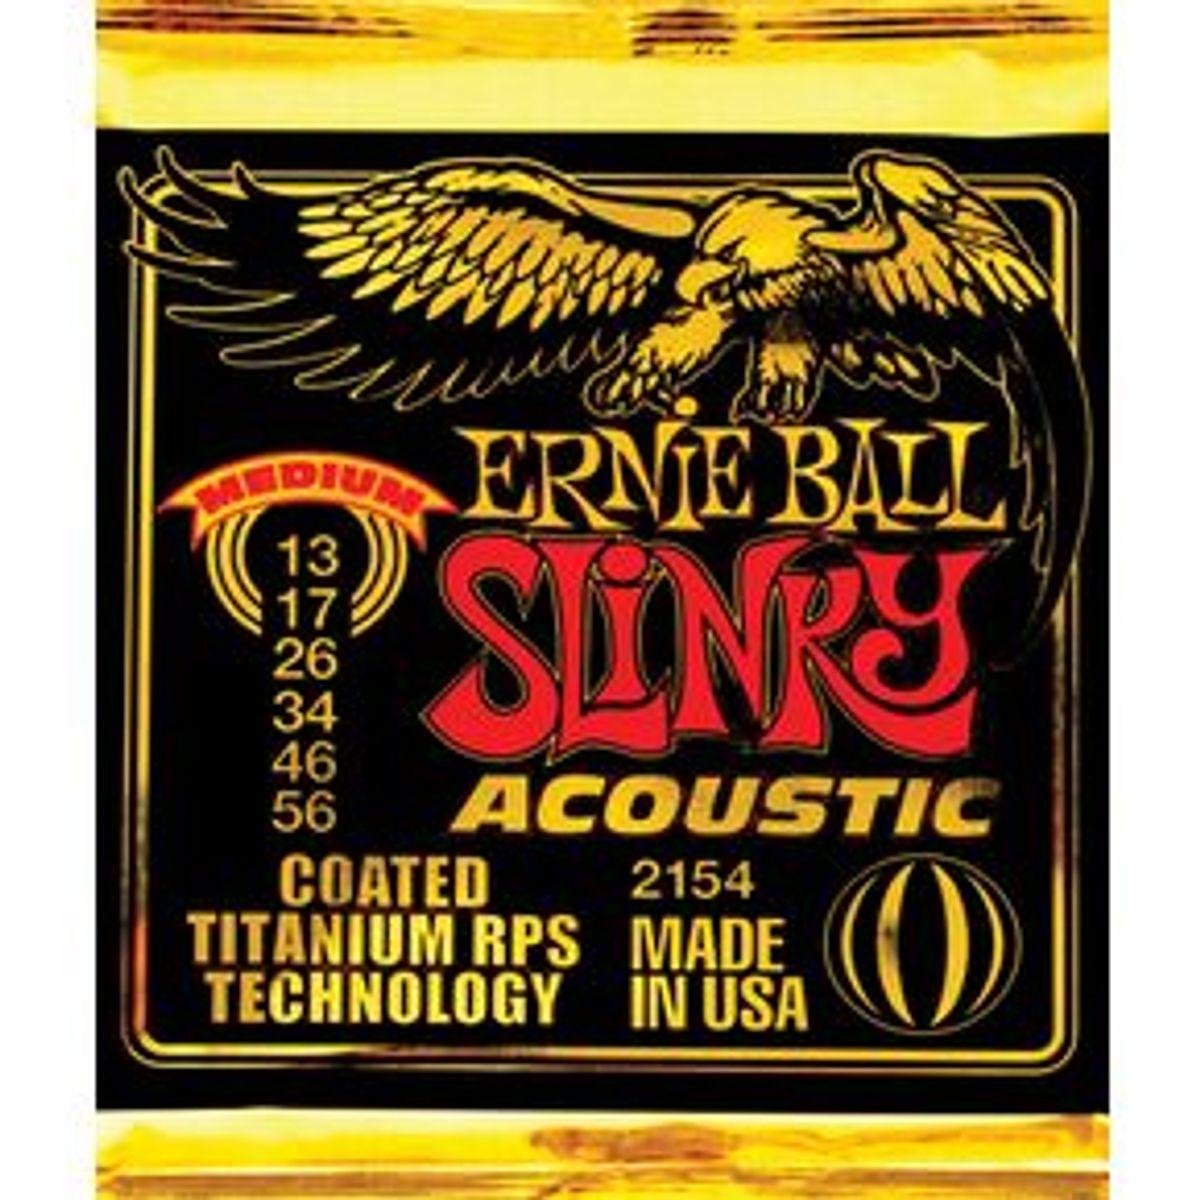 Ernie Ball Coated Titanium Slinky Acoustic Strings